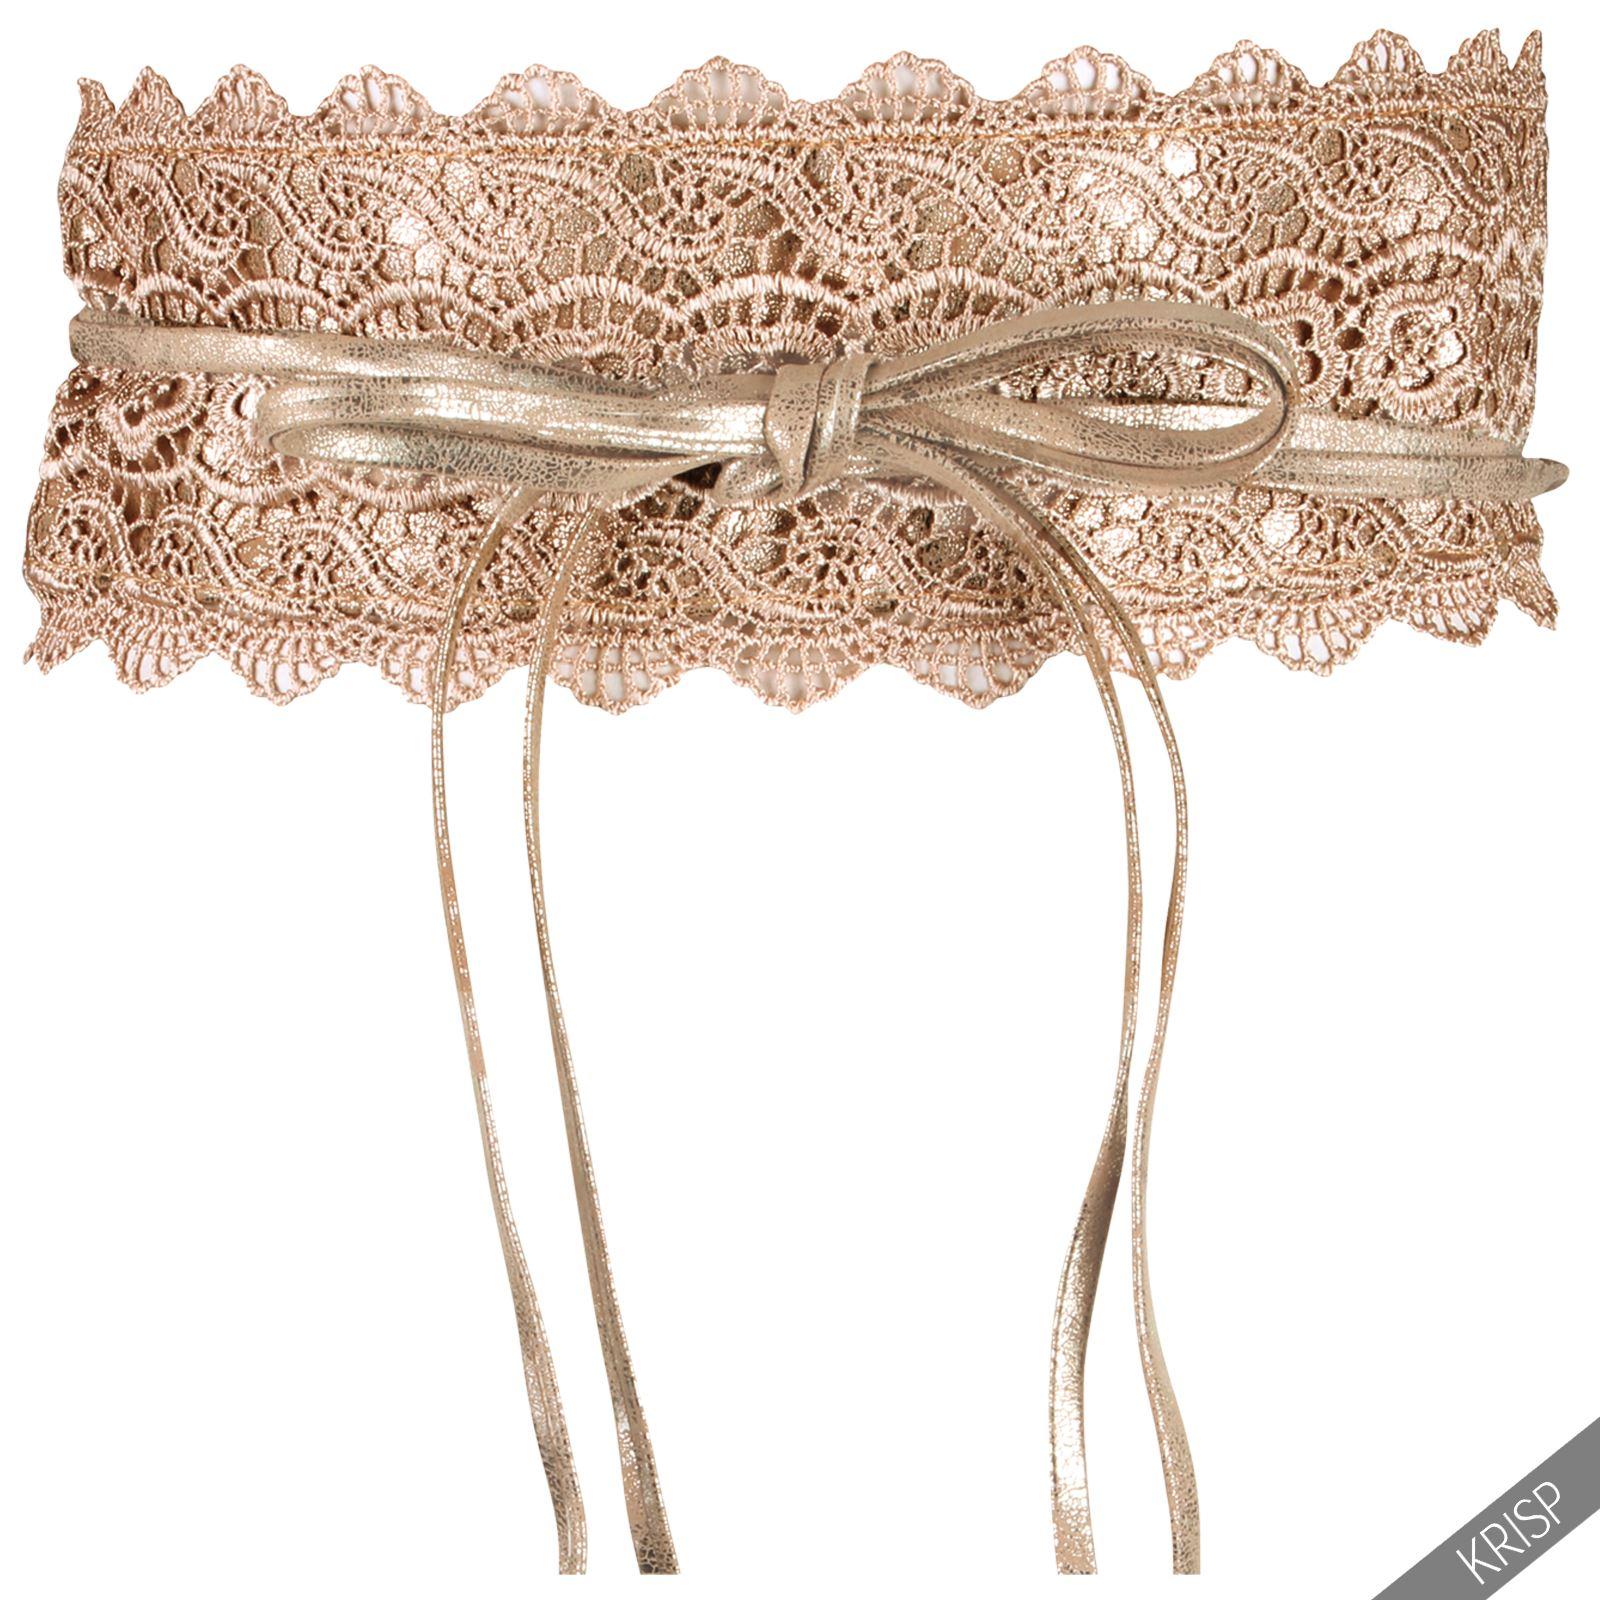 Womens-Floral-Crochet-Self-Tie-Wrap-Around-Obi-Waist-Band-Cinch-Belt-US